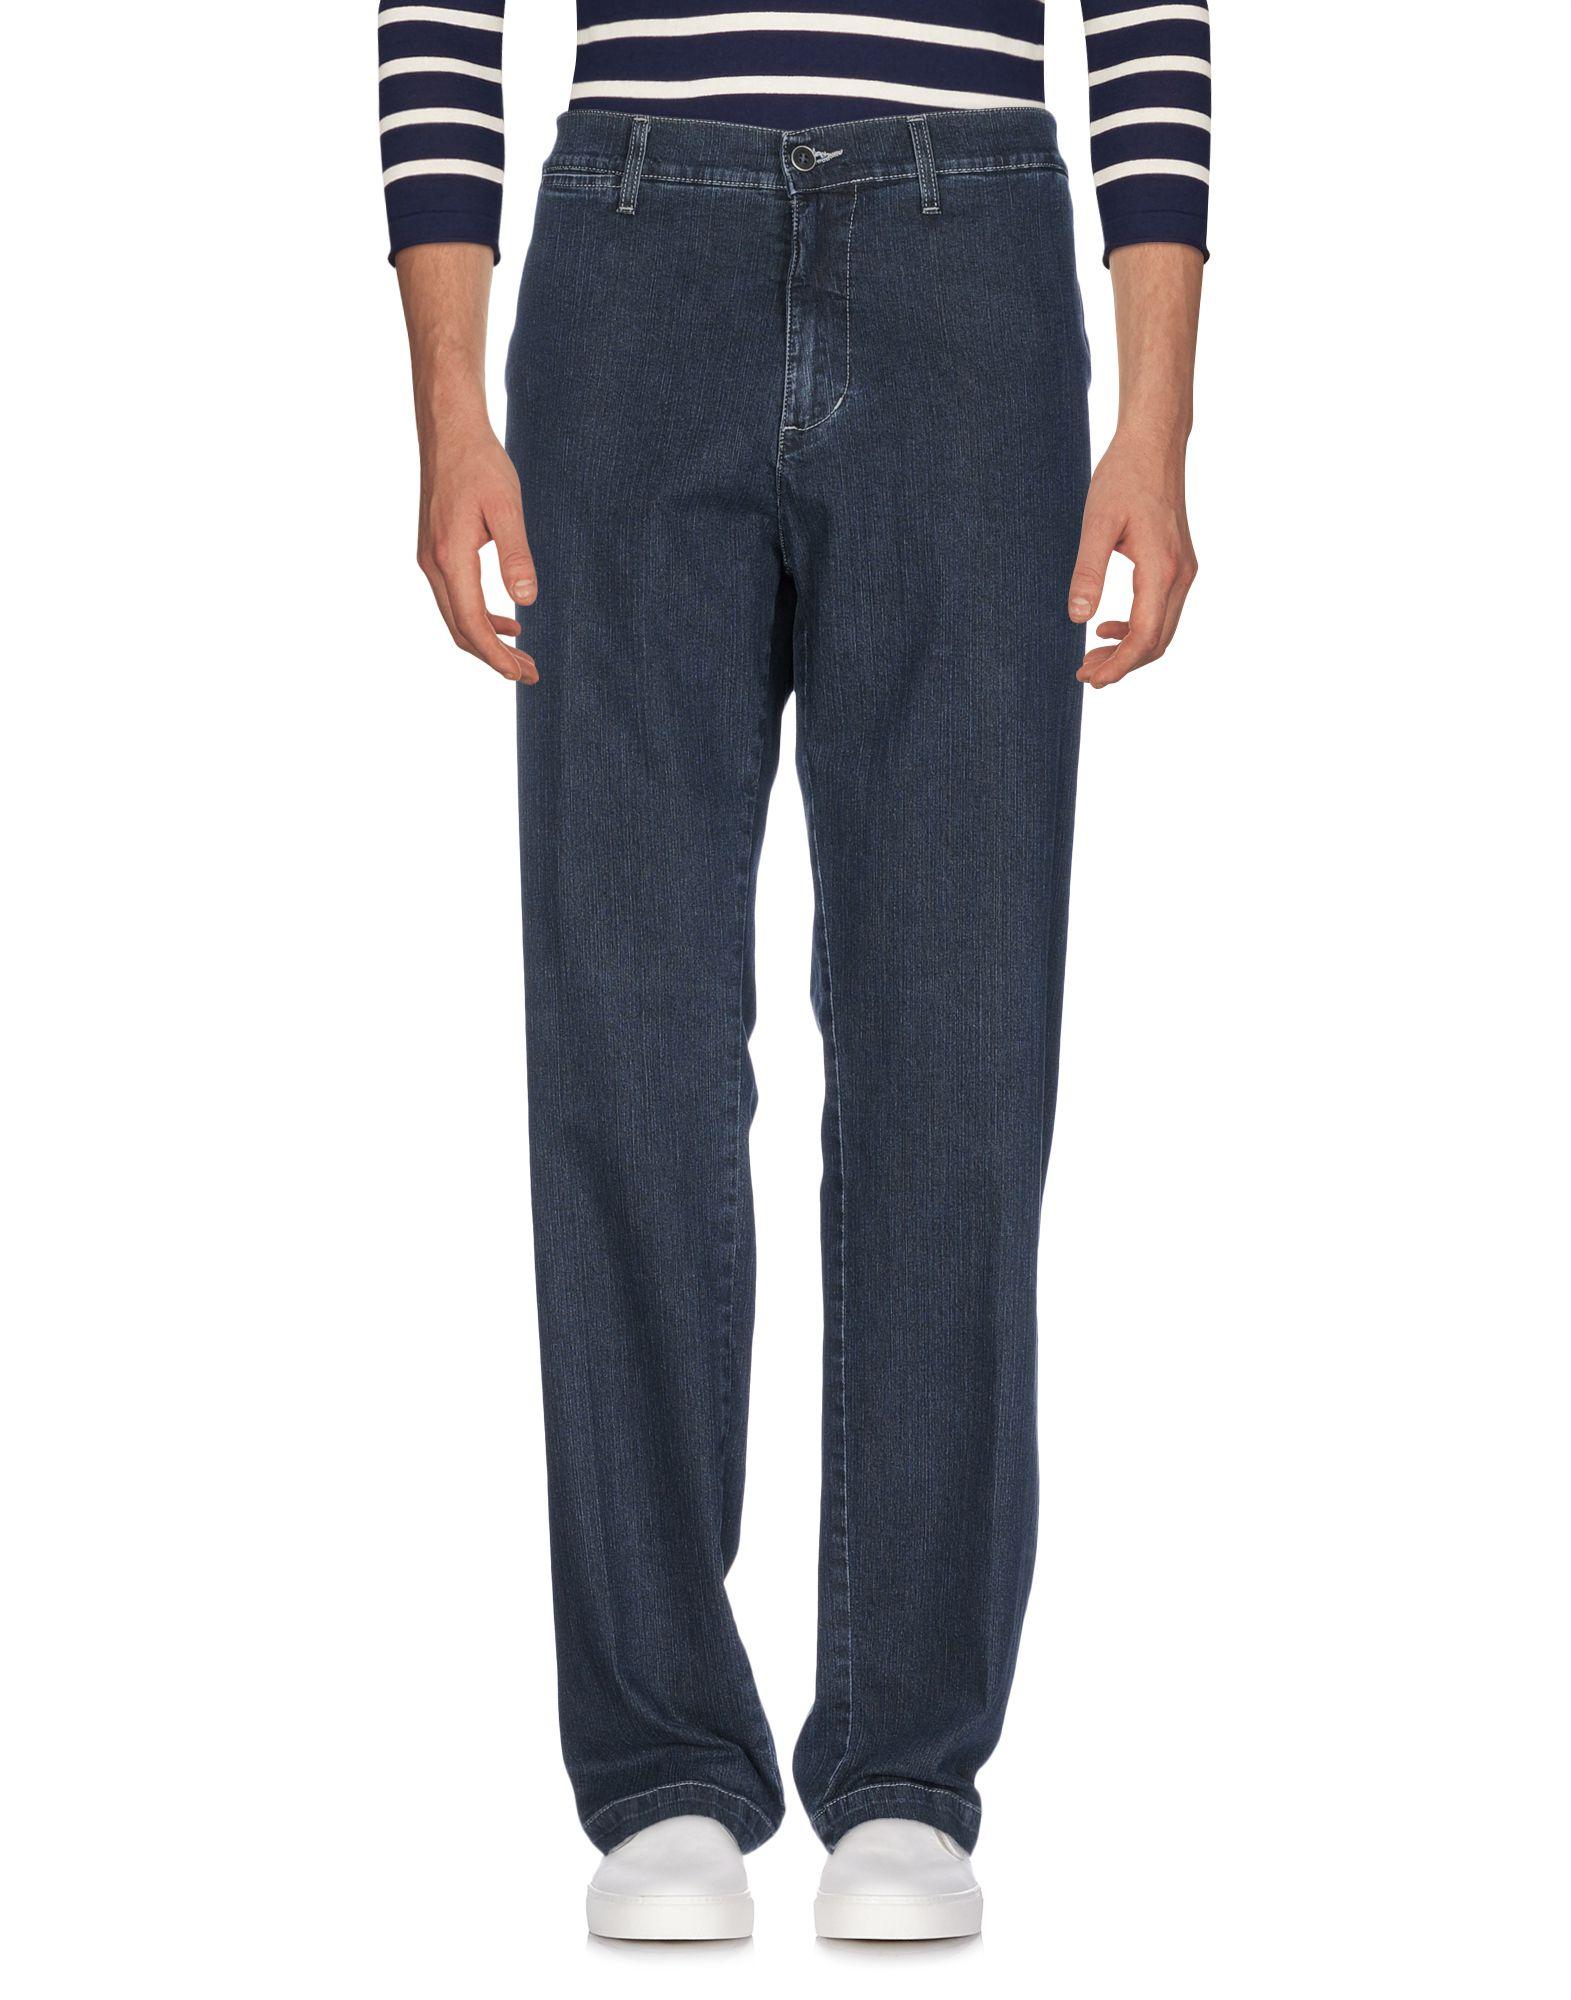 цена HOLIDAY JEANS COMPANY Джинсовые брюки онлайн в 2017 году